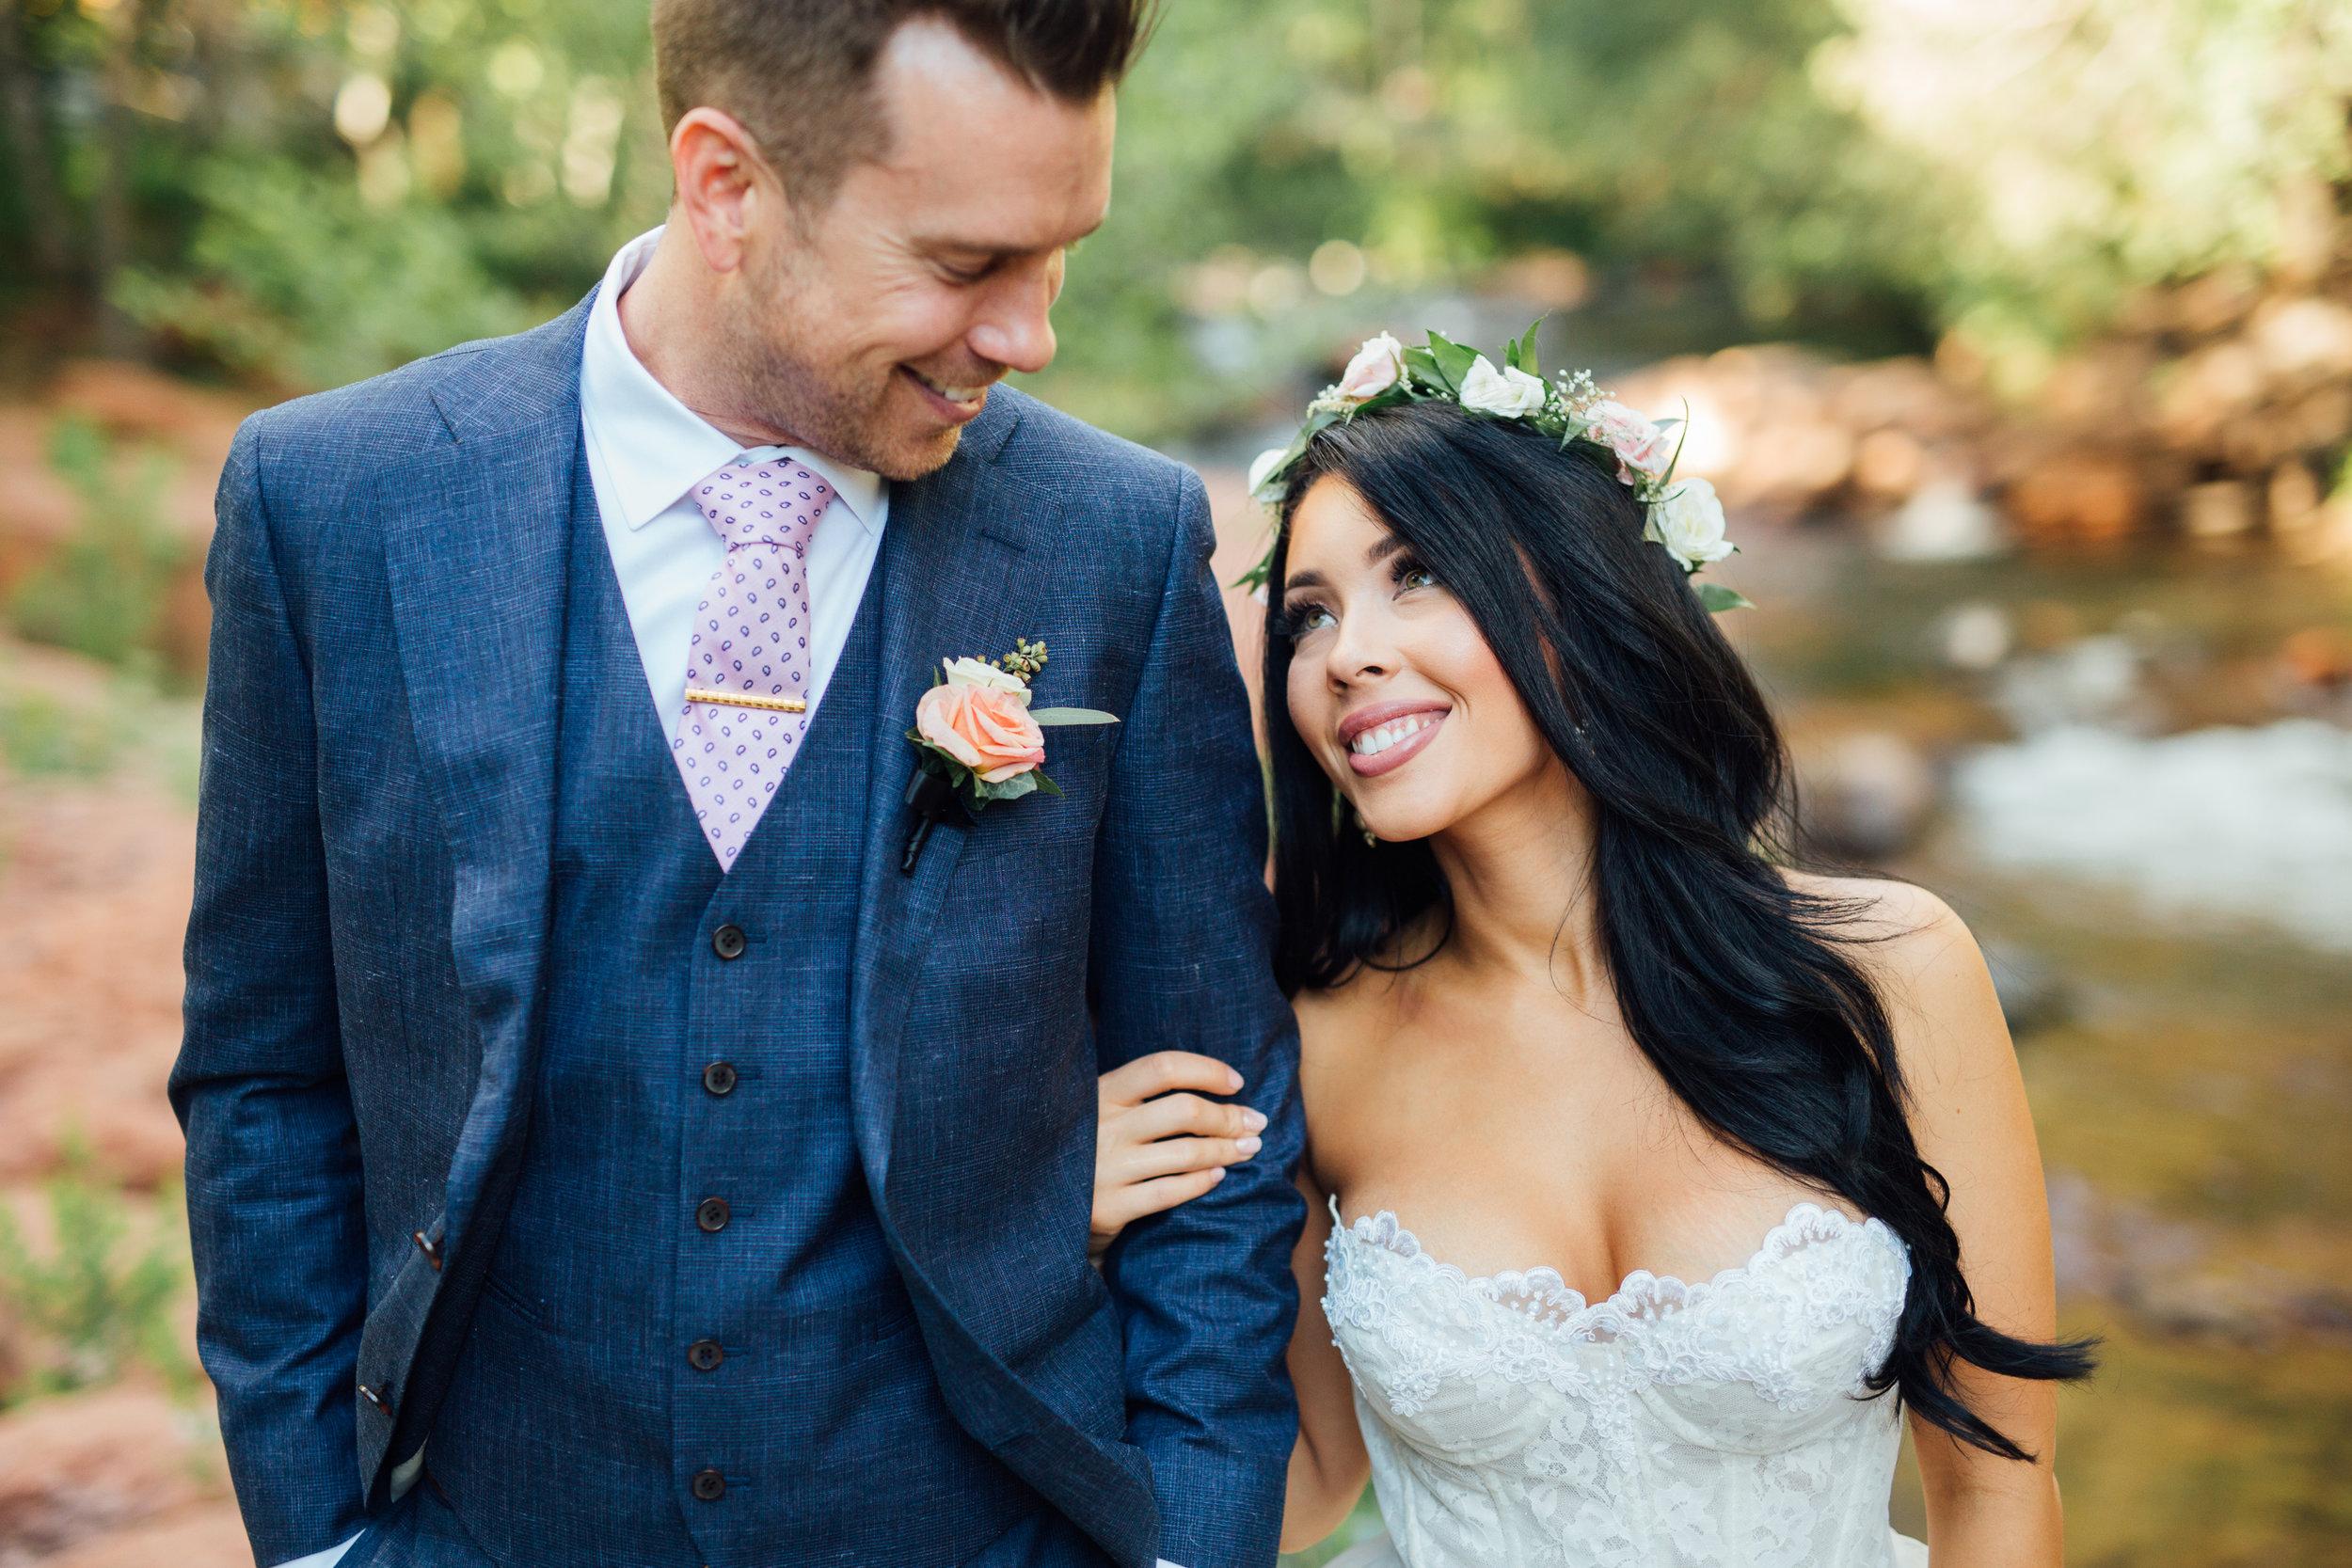 LMW-Sedona-lauberge-wedding-5647.jpg